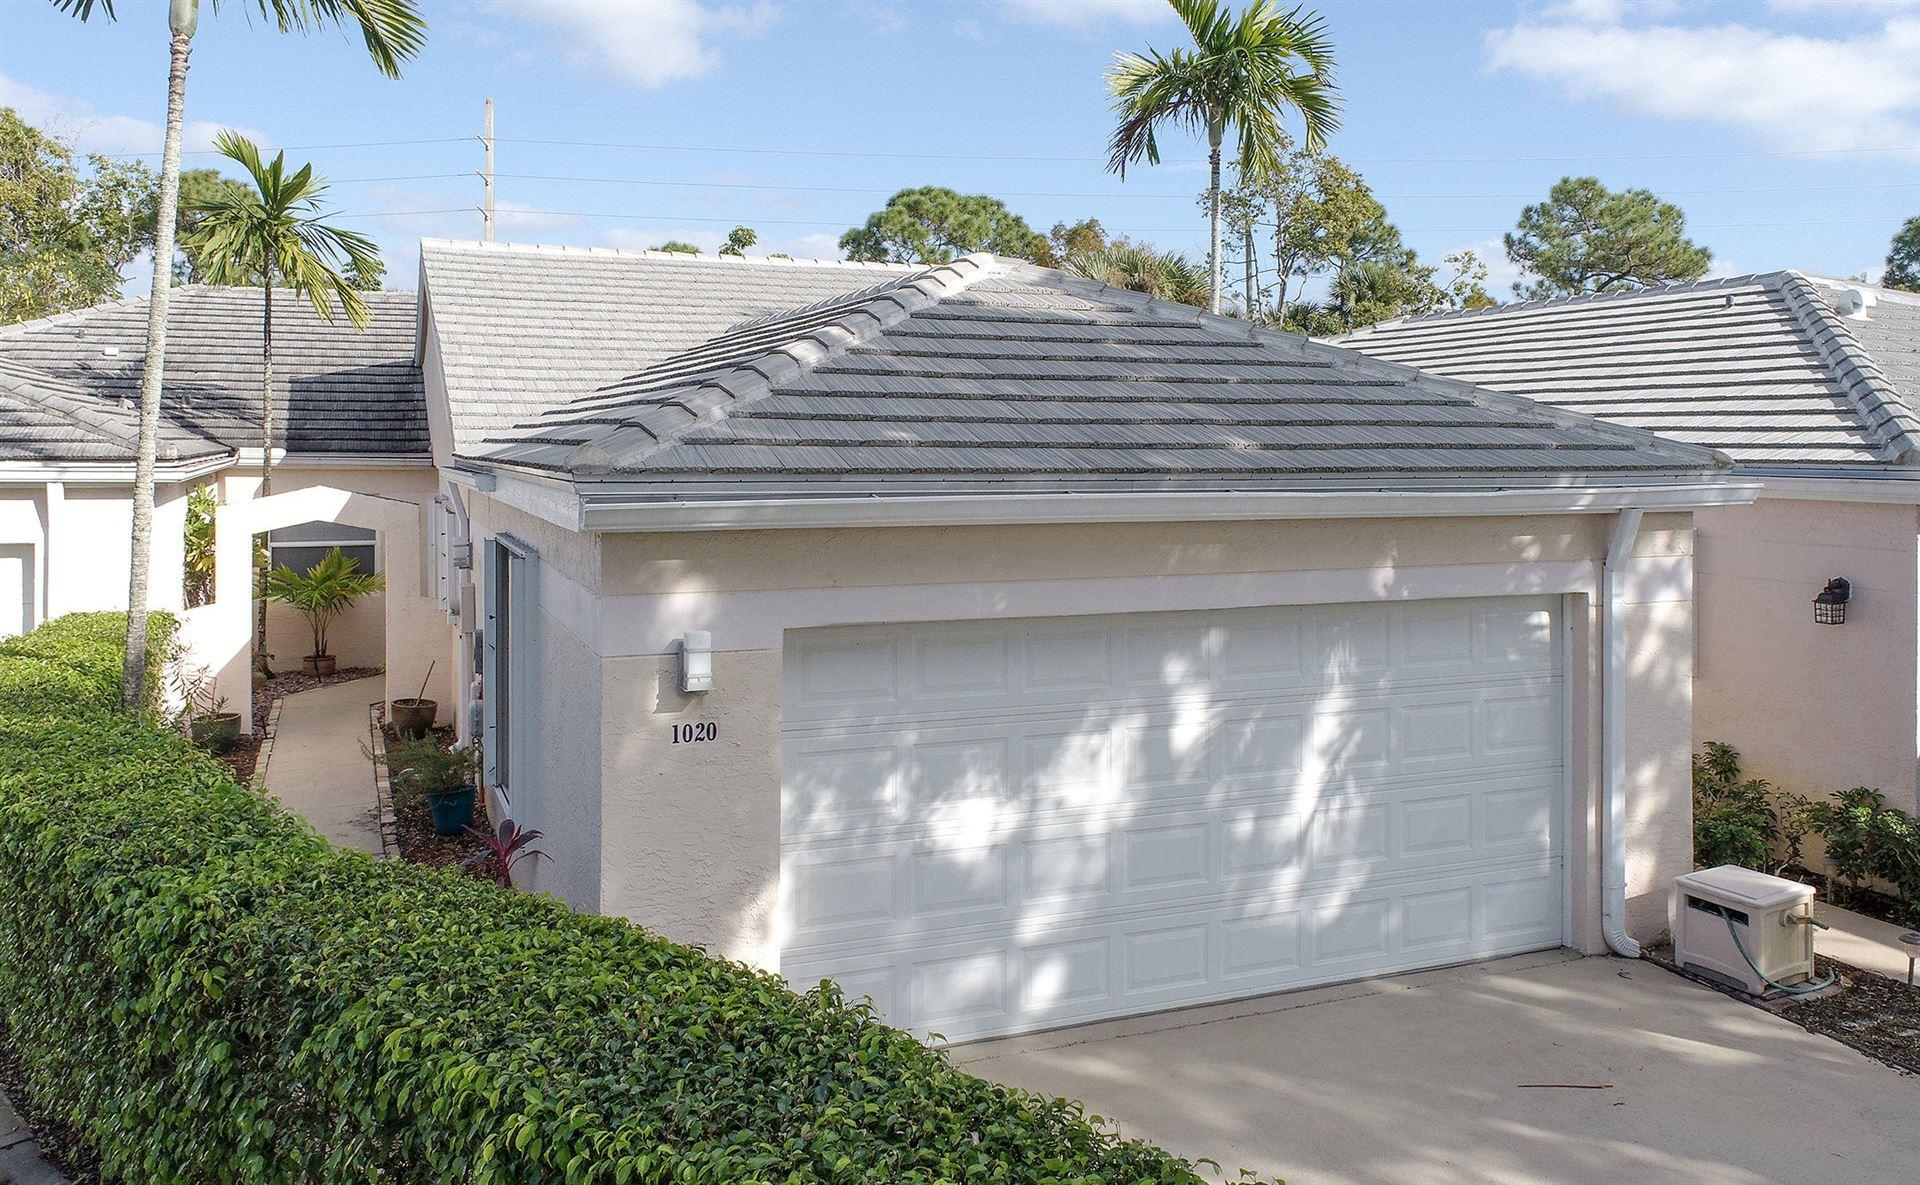 Photo of 1020 Island Manor Drive, Greenacres, FL 33413 (MLS # RX-10679385)